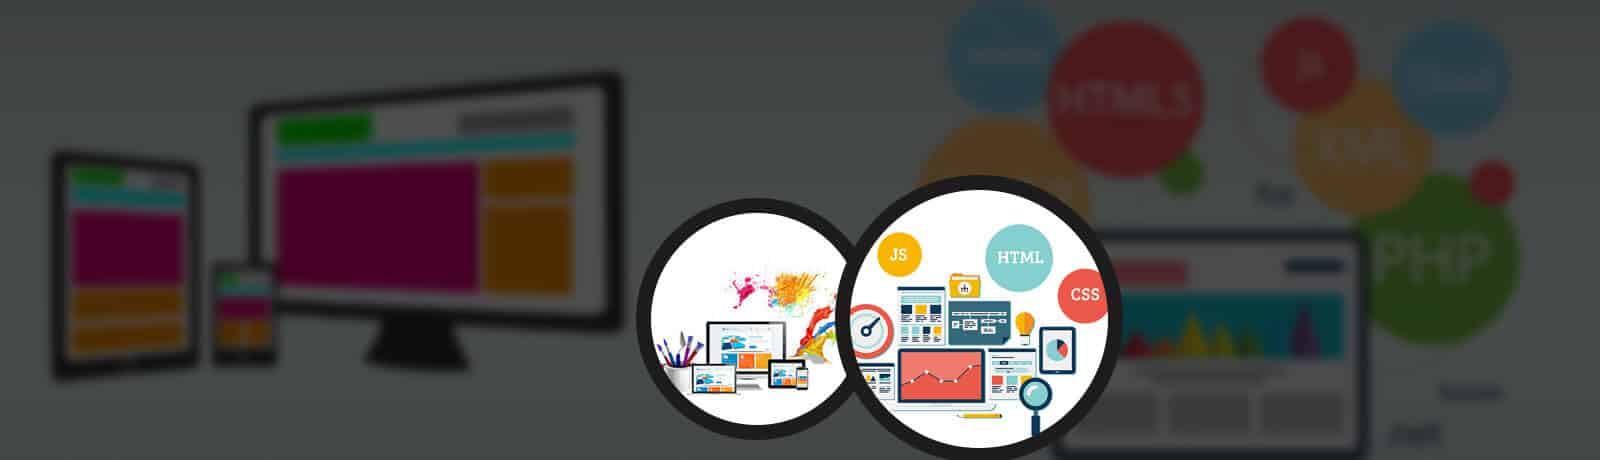 Web Development Service Dubai, UAE